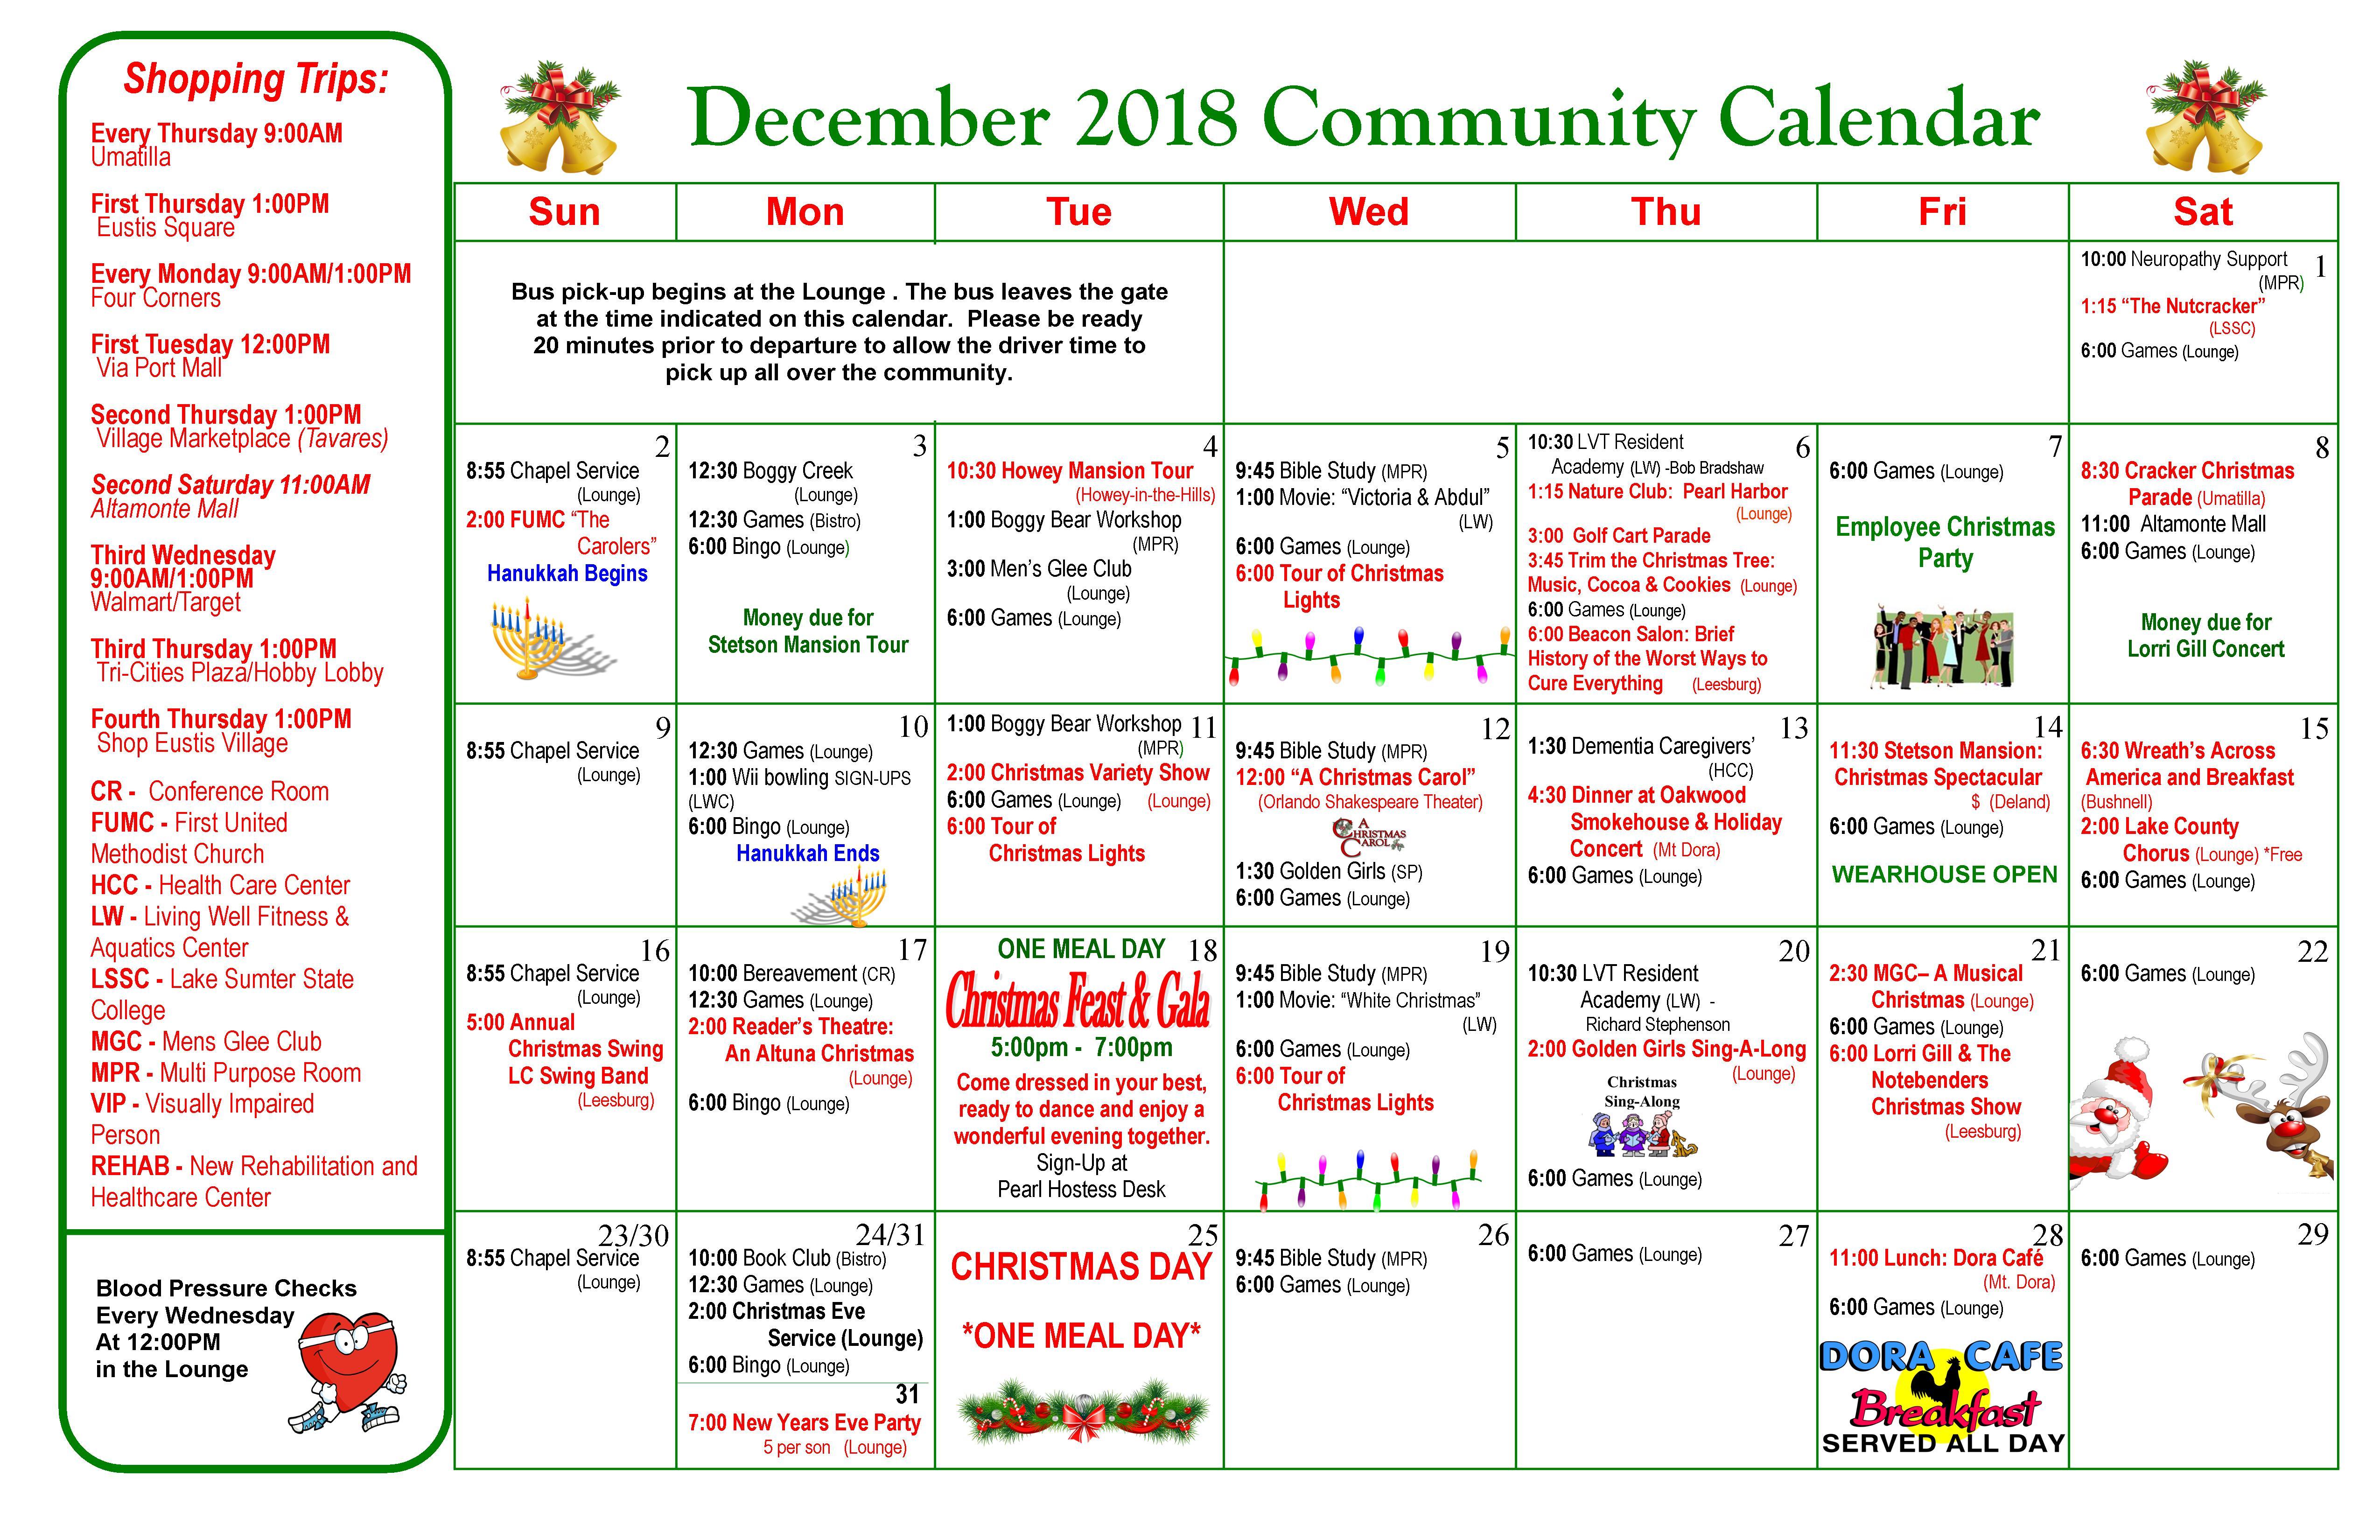 Dec. 2018